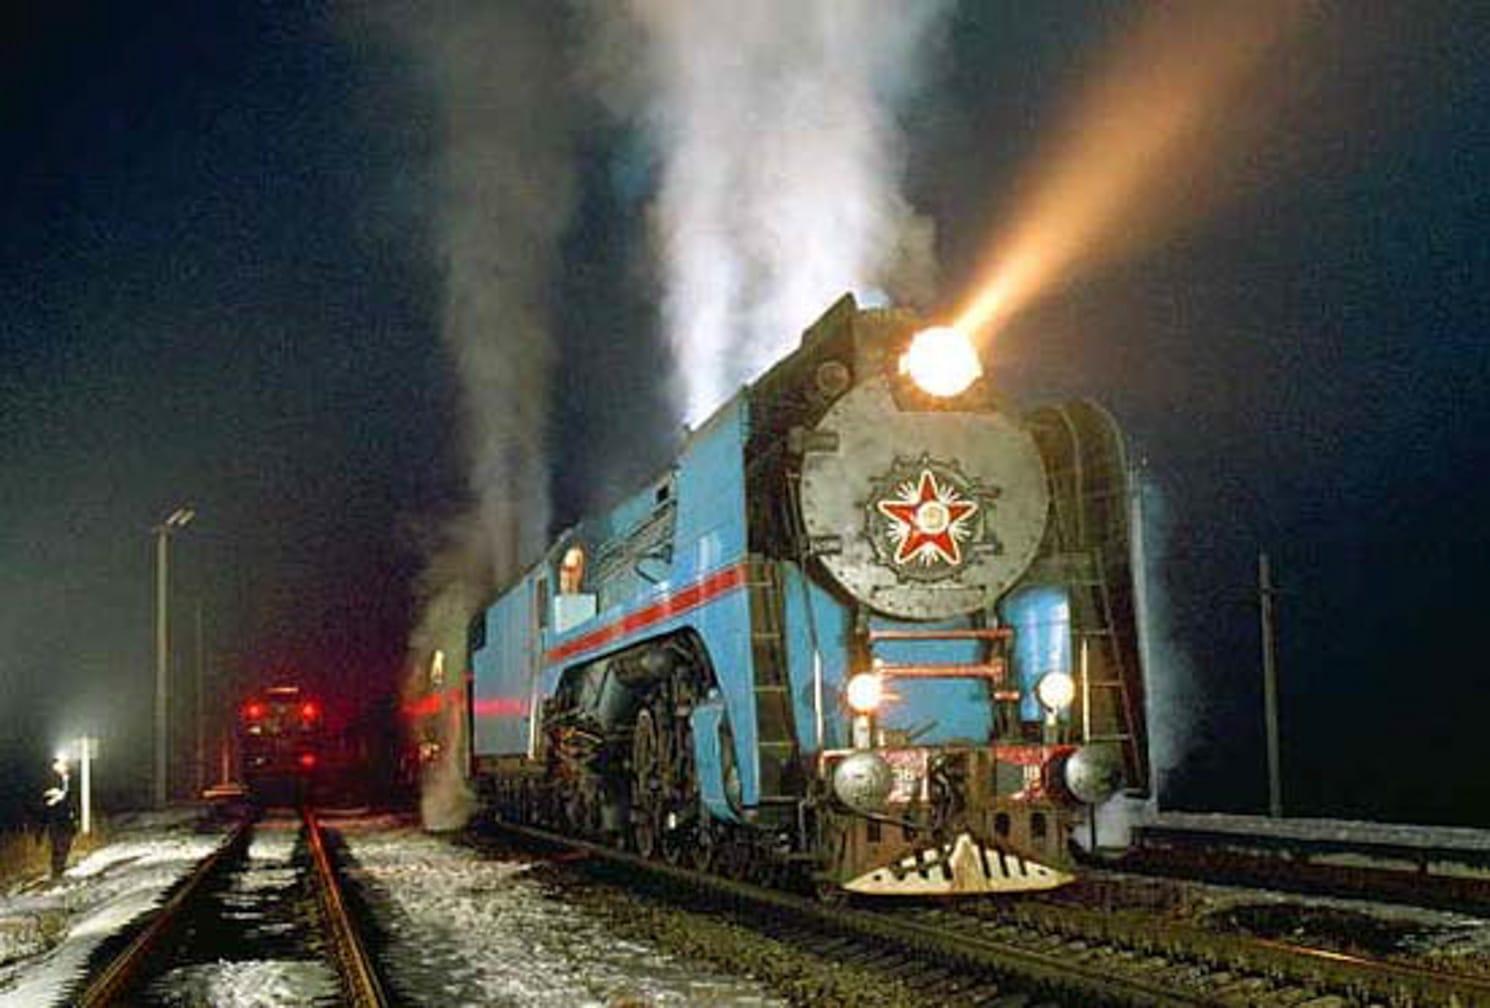 Train on the Trans-Siberian Winter Wonderland by Steam journey